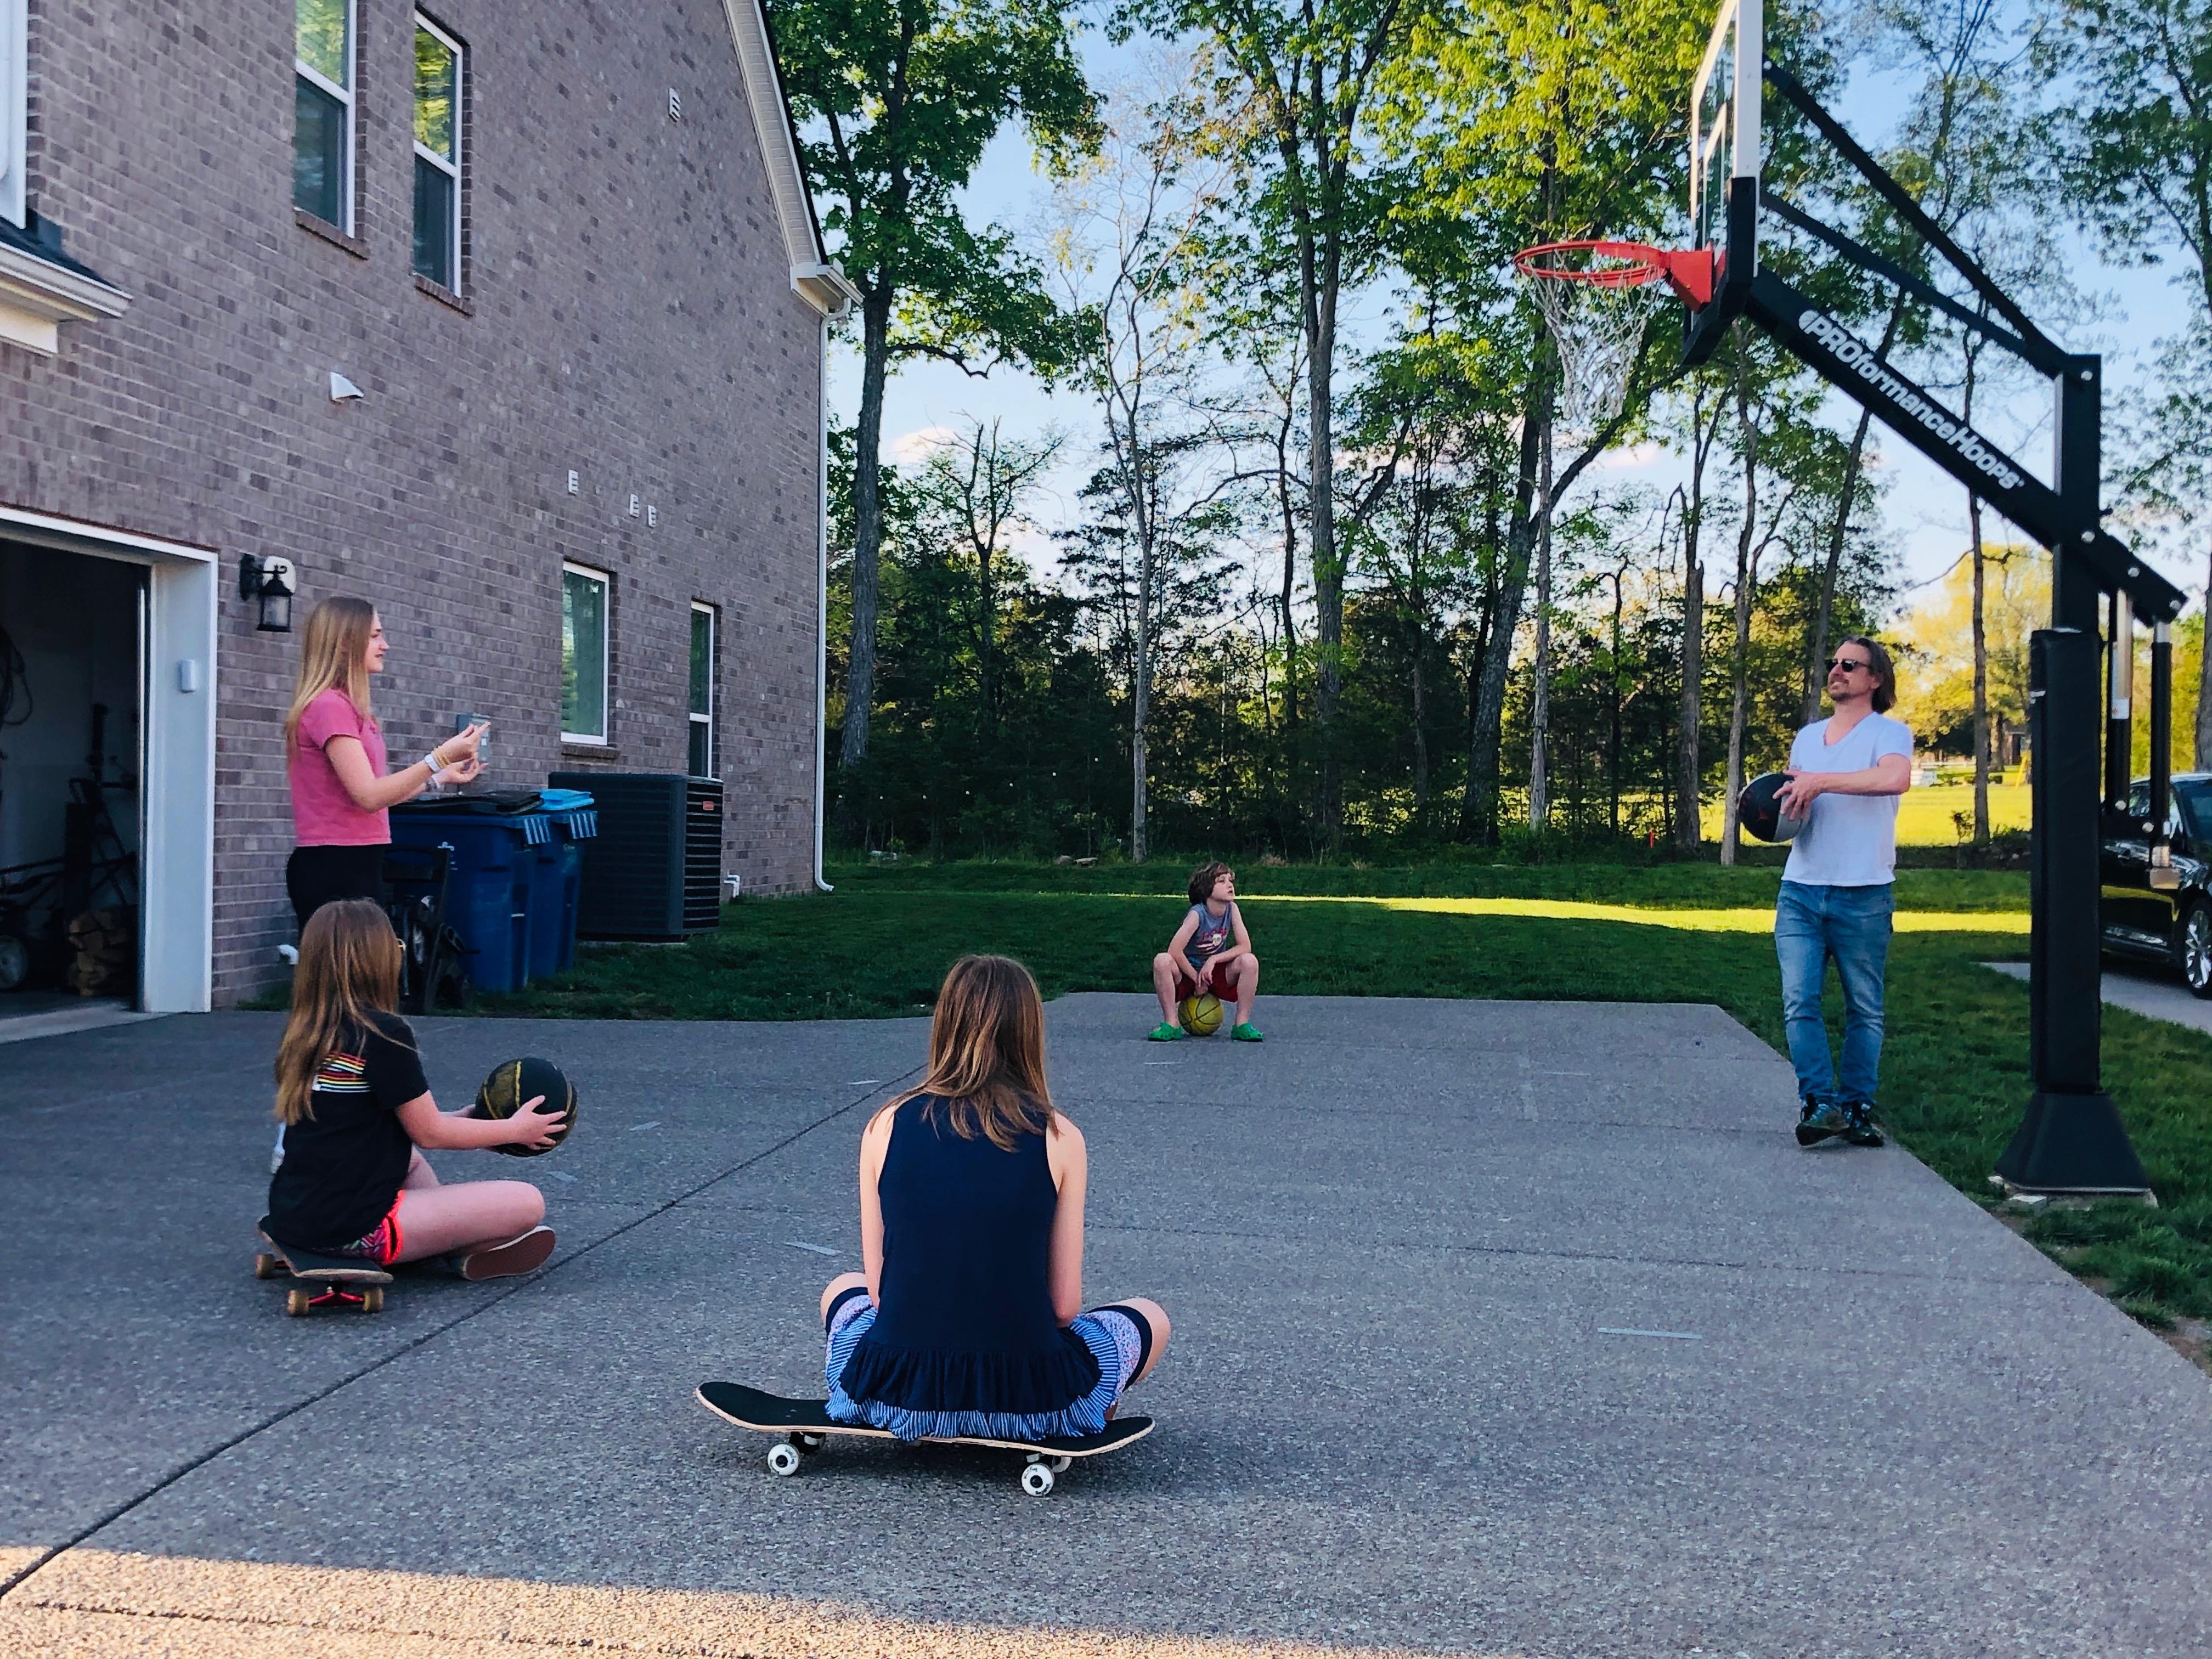 Family playing basketball outside